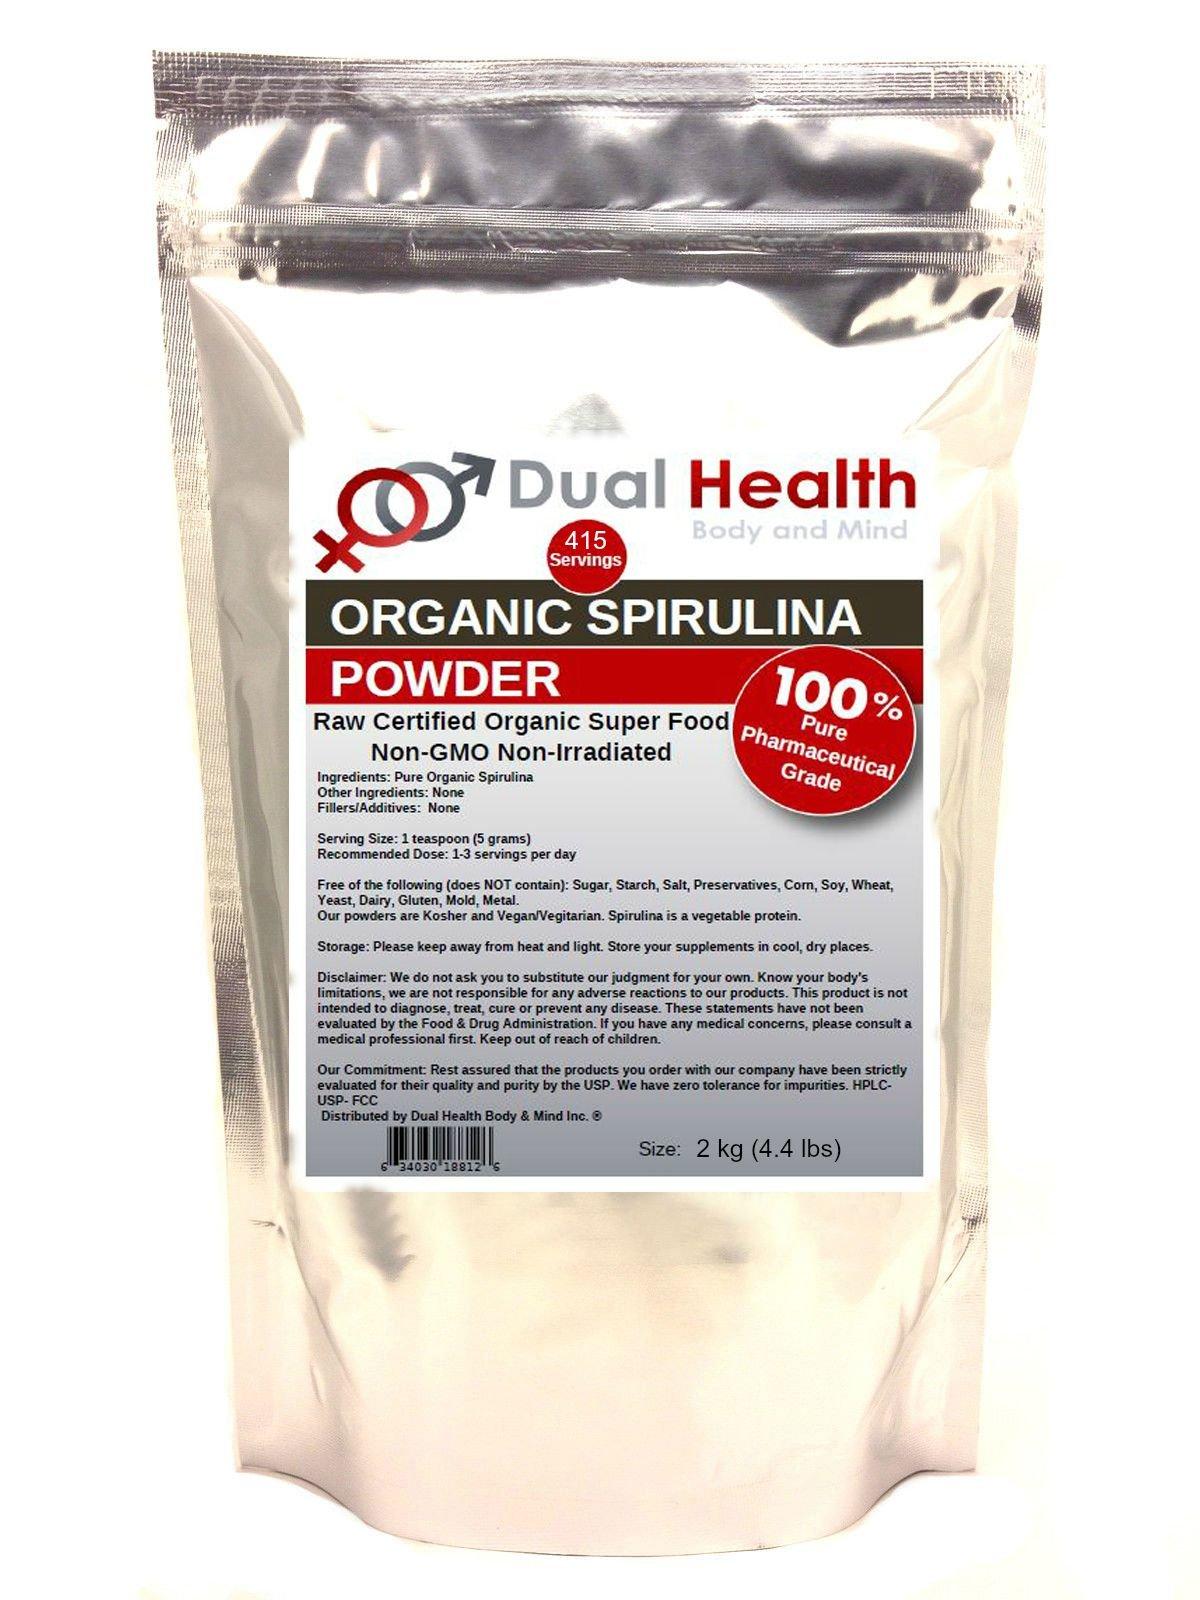 Pure Organic Spirulina (2kg (4.4 lbs)) Protein Powder USDA Chlorophyll Non-GMO Non-Irradiated Bulk Supplements